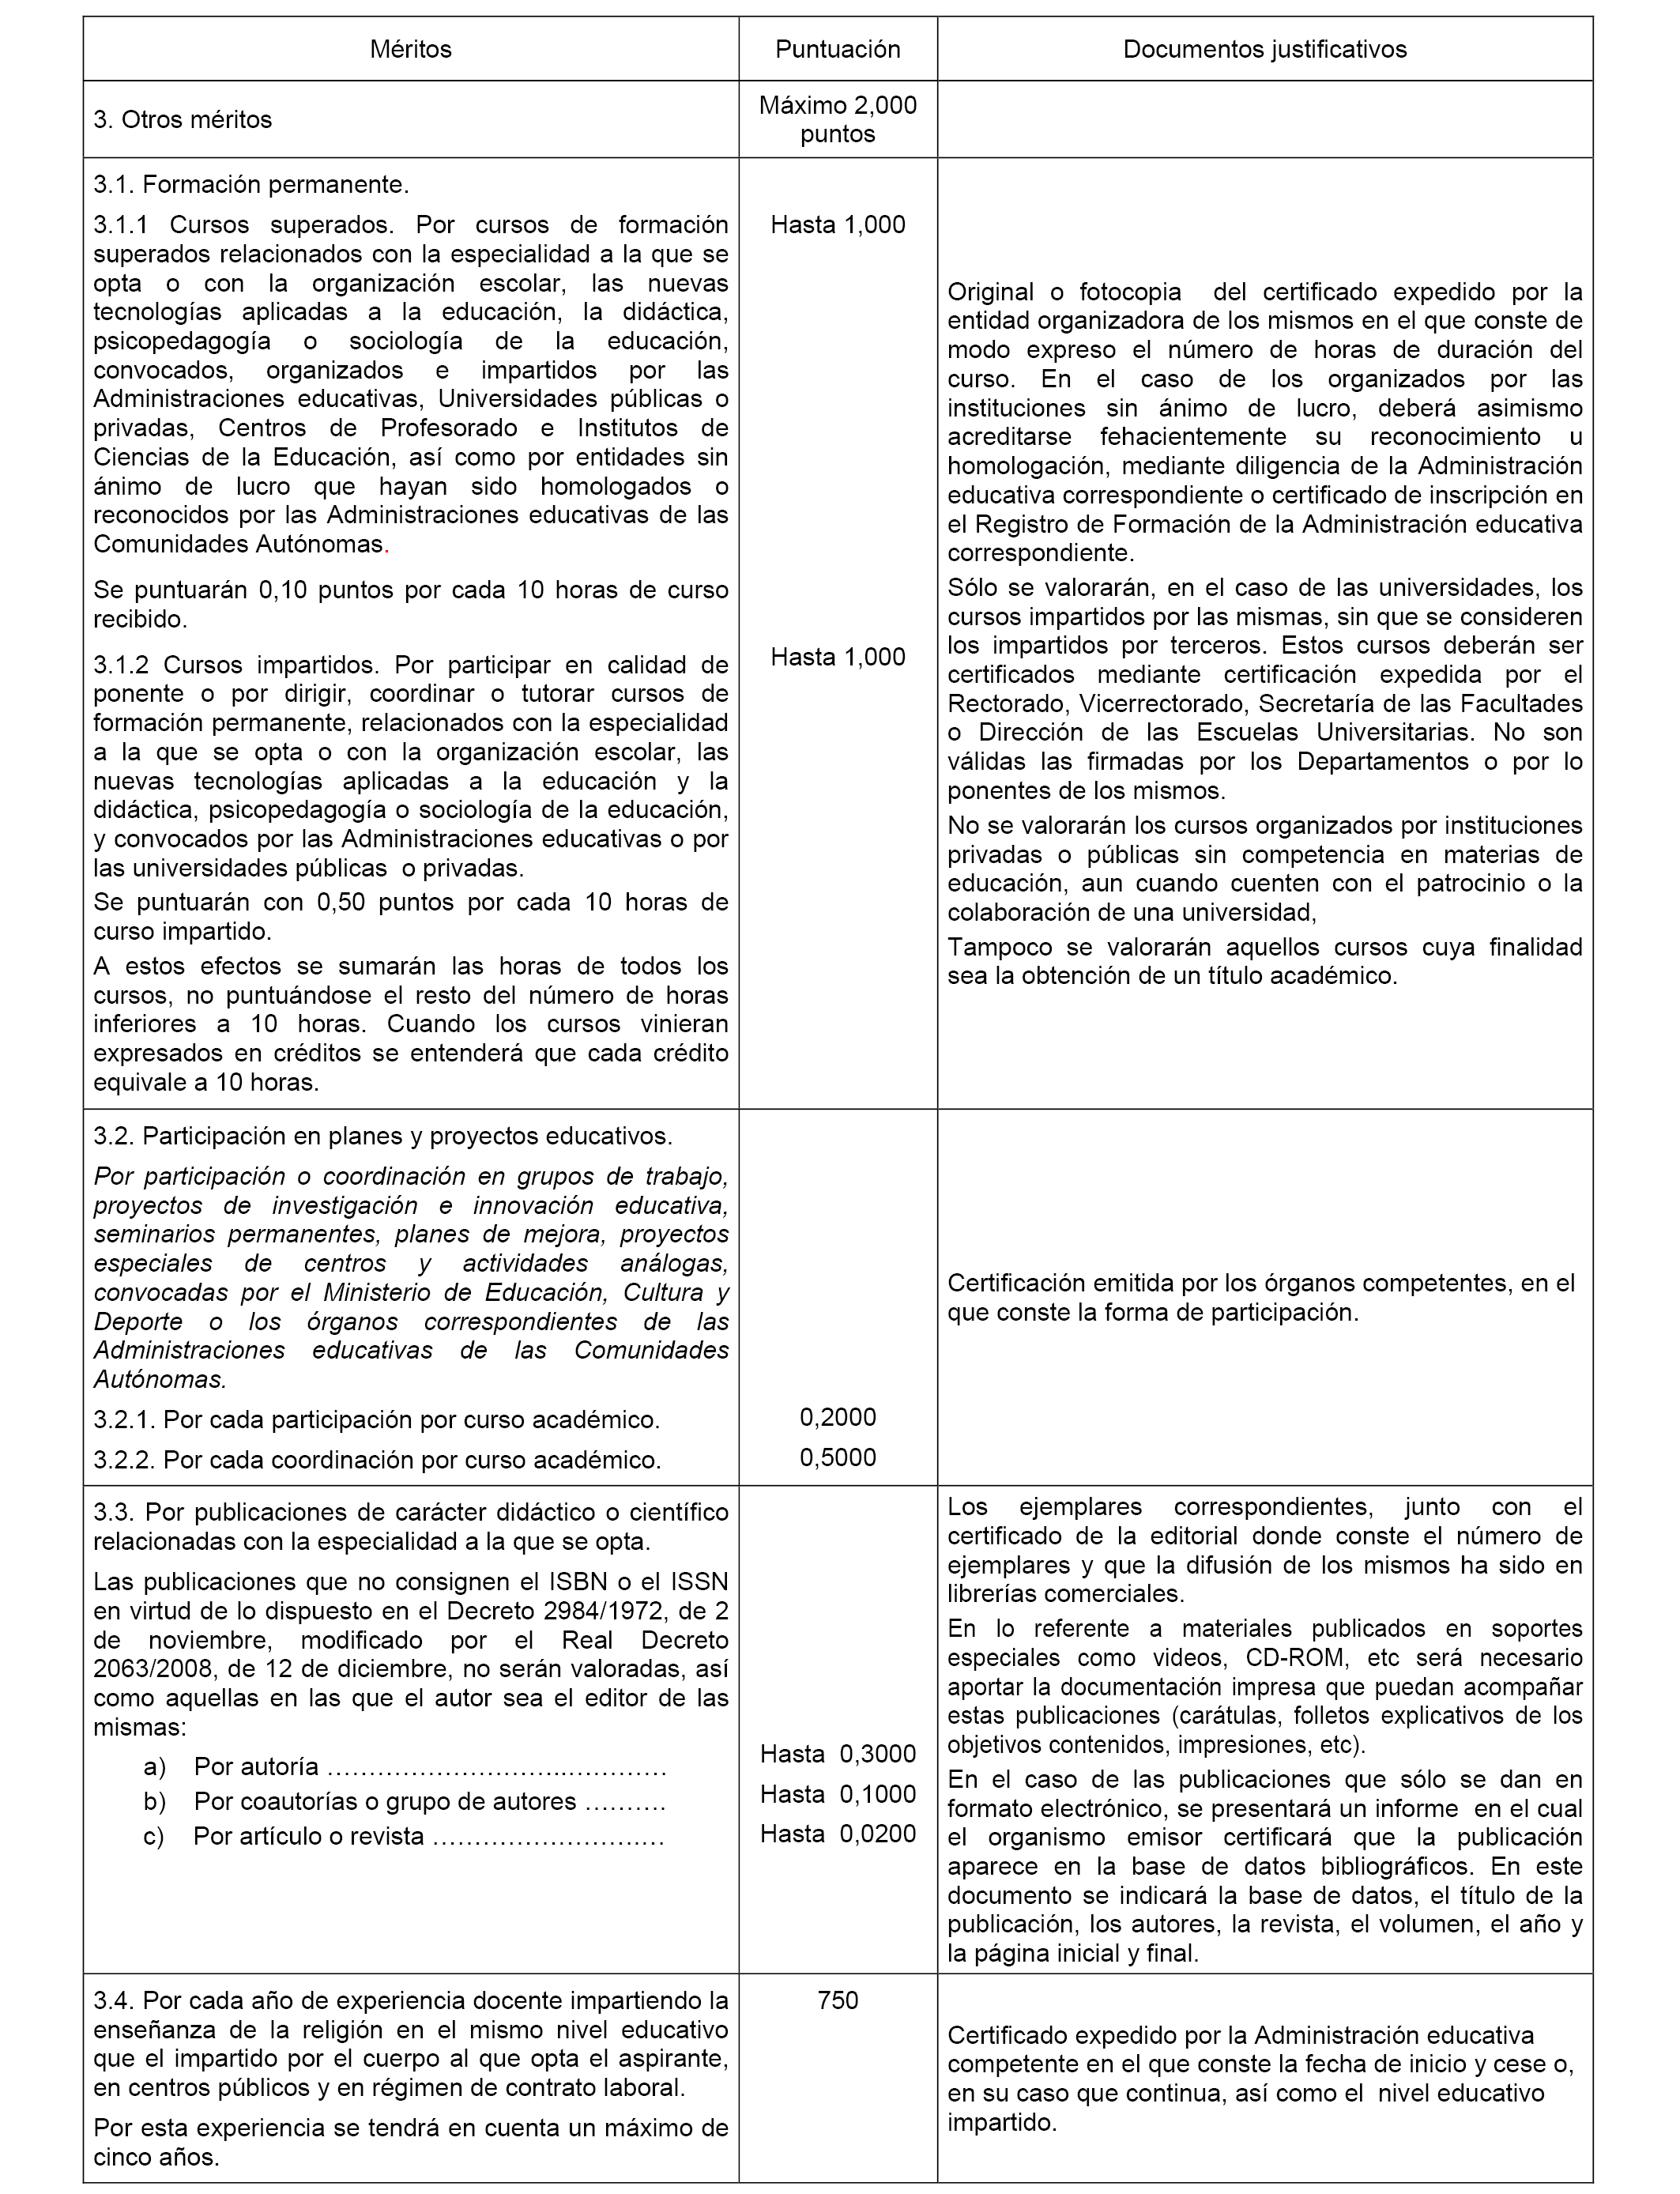 Lujoso Formato De Curriculum De Codificación Médica Bosquejo ...